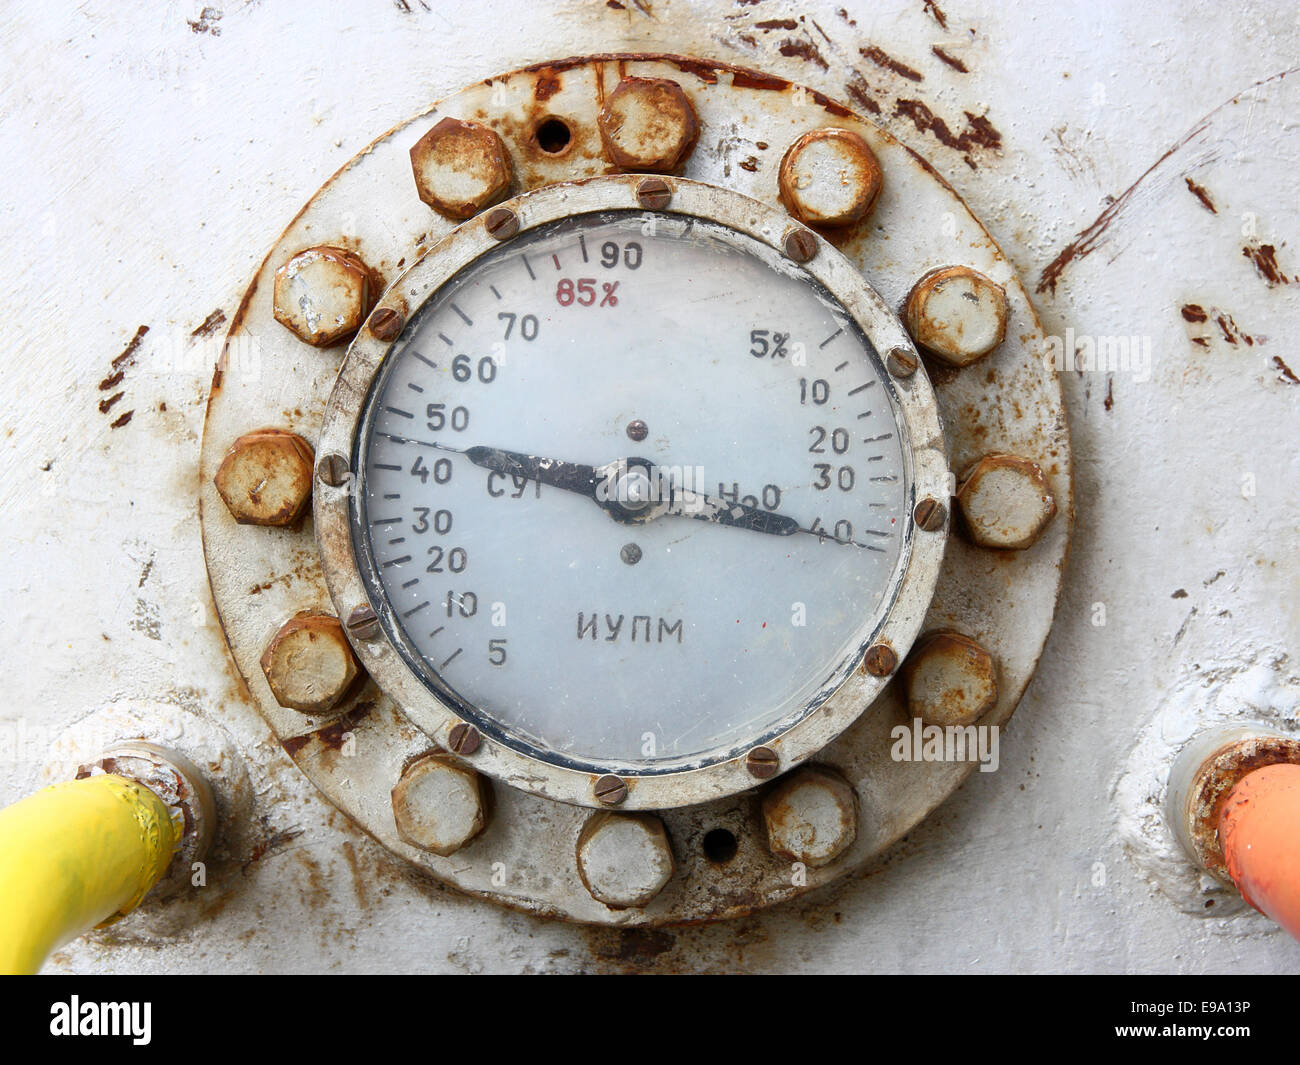 Old rusty gas gauge manometer - Stock Image